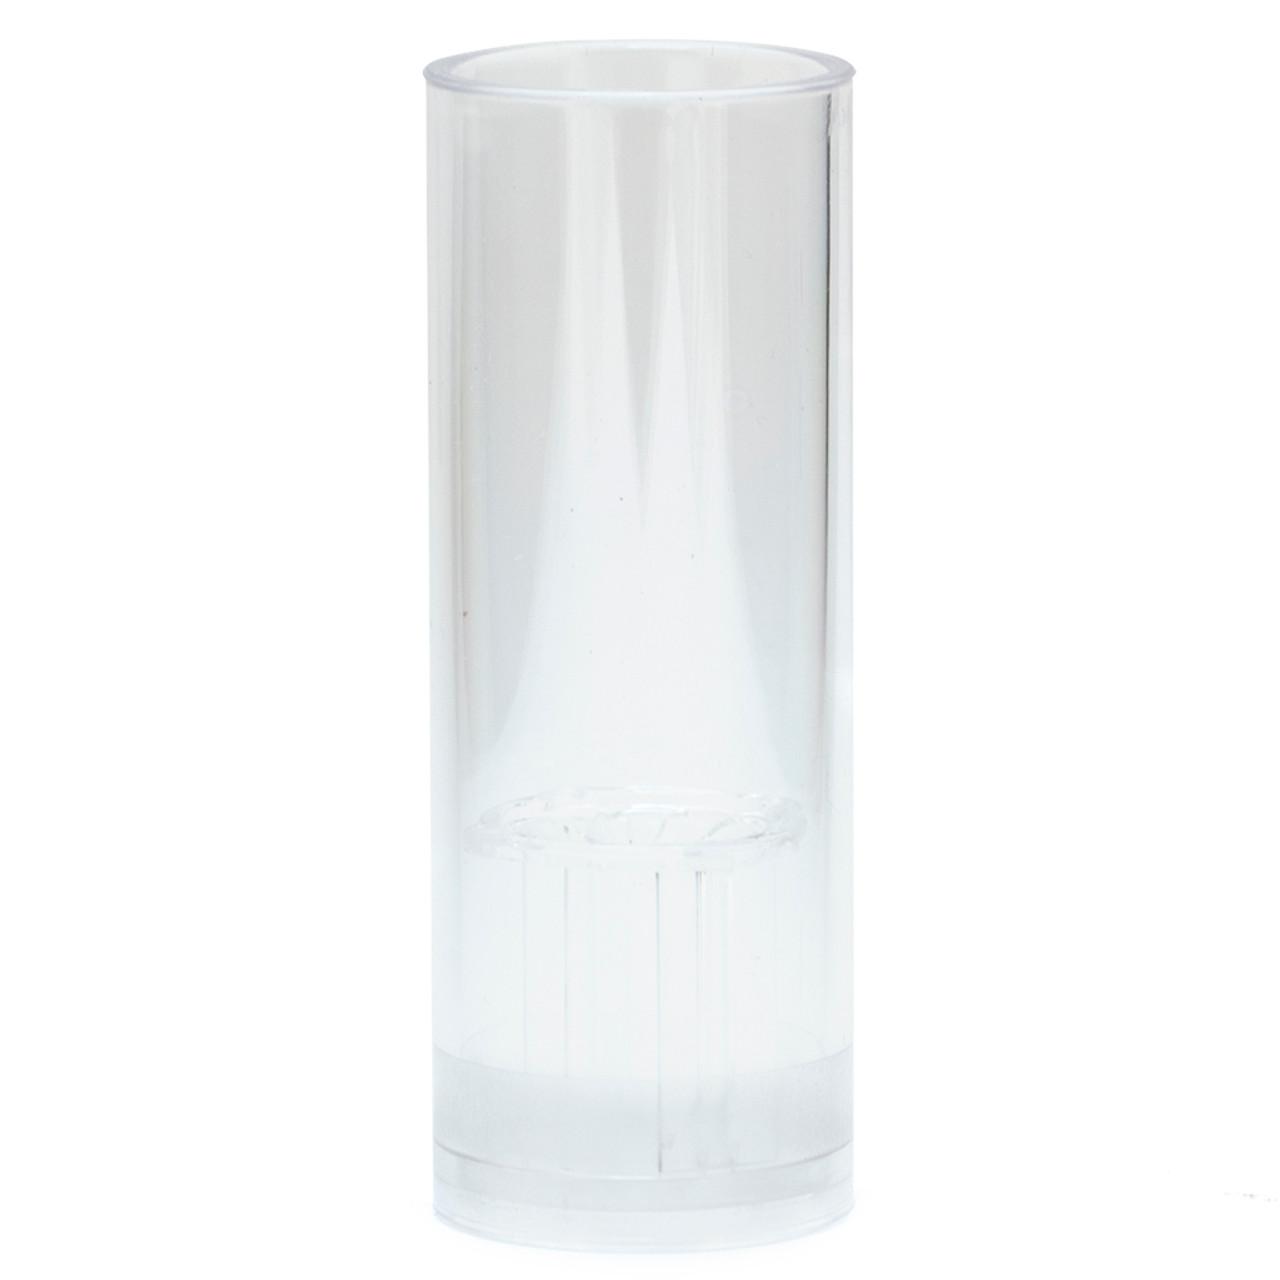 Dry Ice Shot Glass